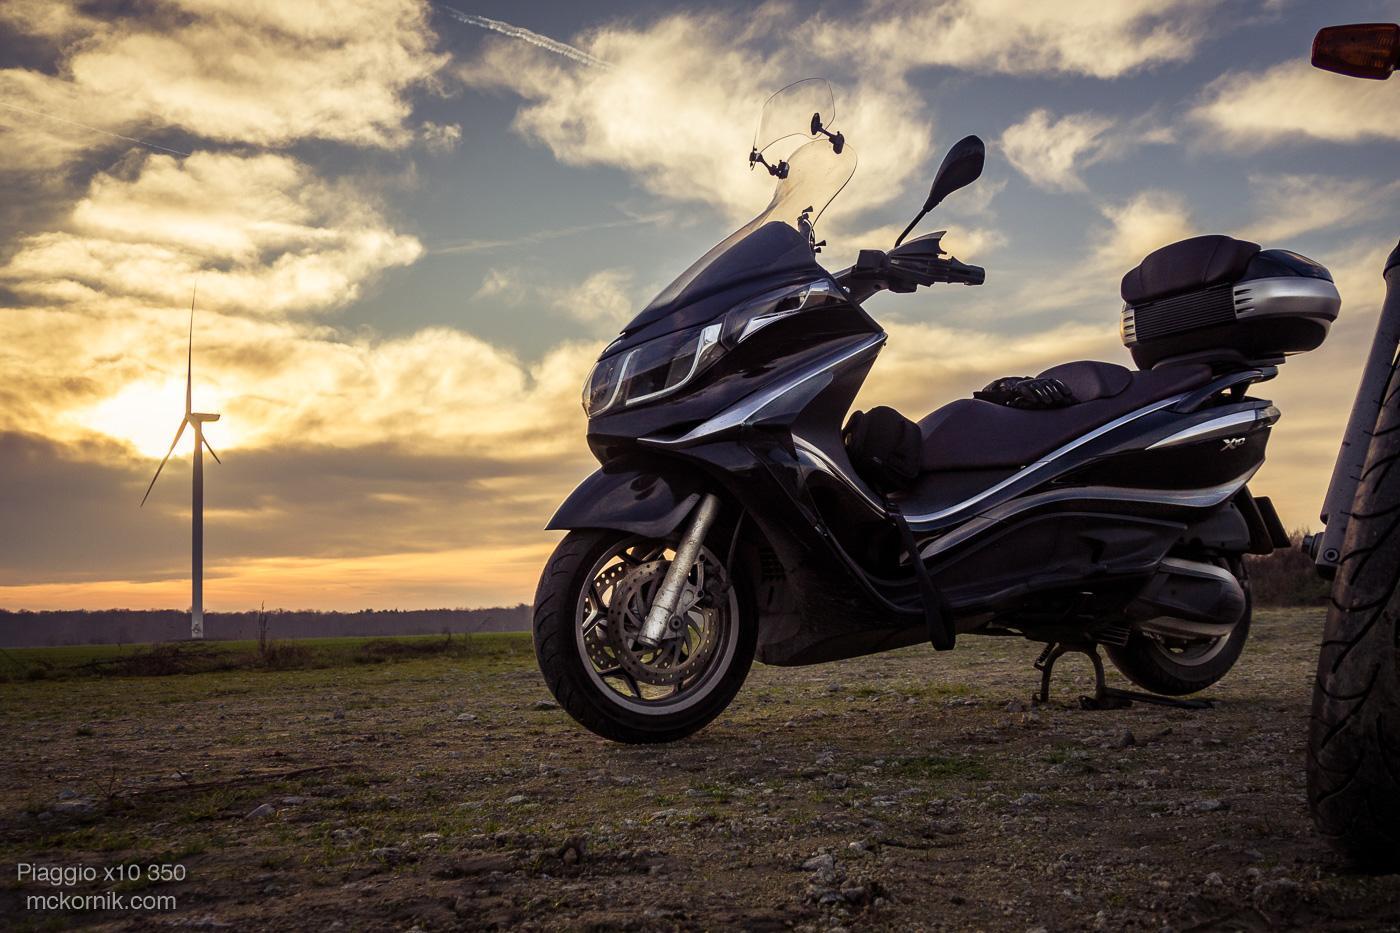 Scooter / motorcycle ride #piaggiox10, #piaggiox10350 and #yamahaxj600n